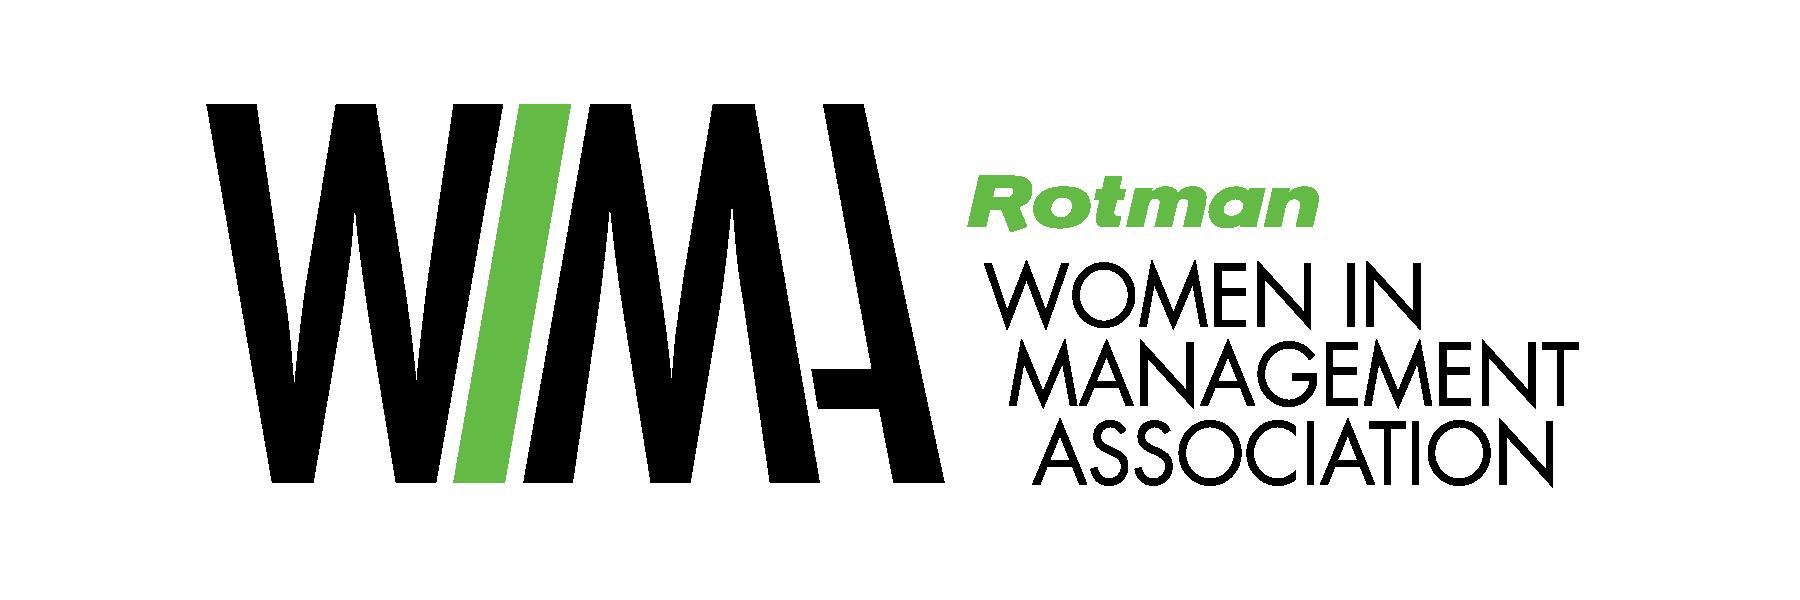 Rotman Women in Management Association